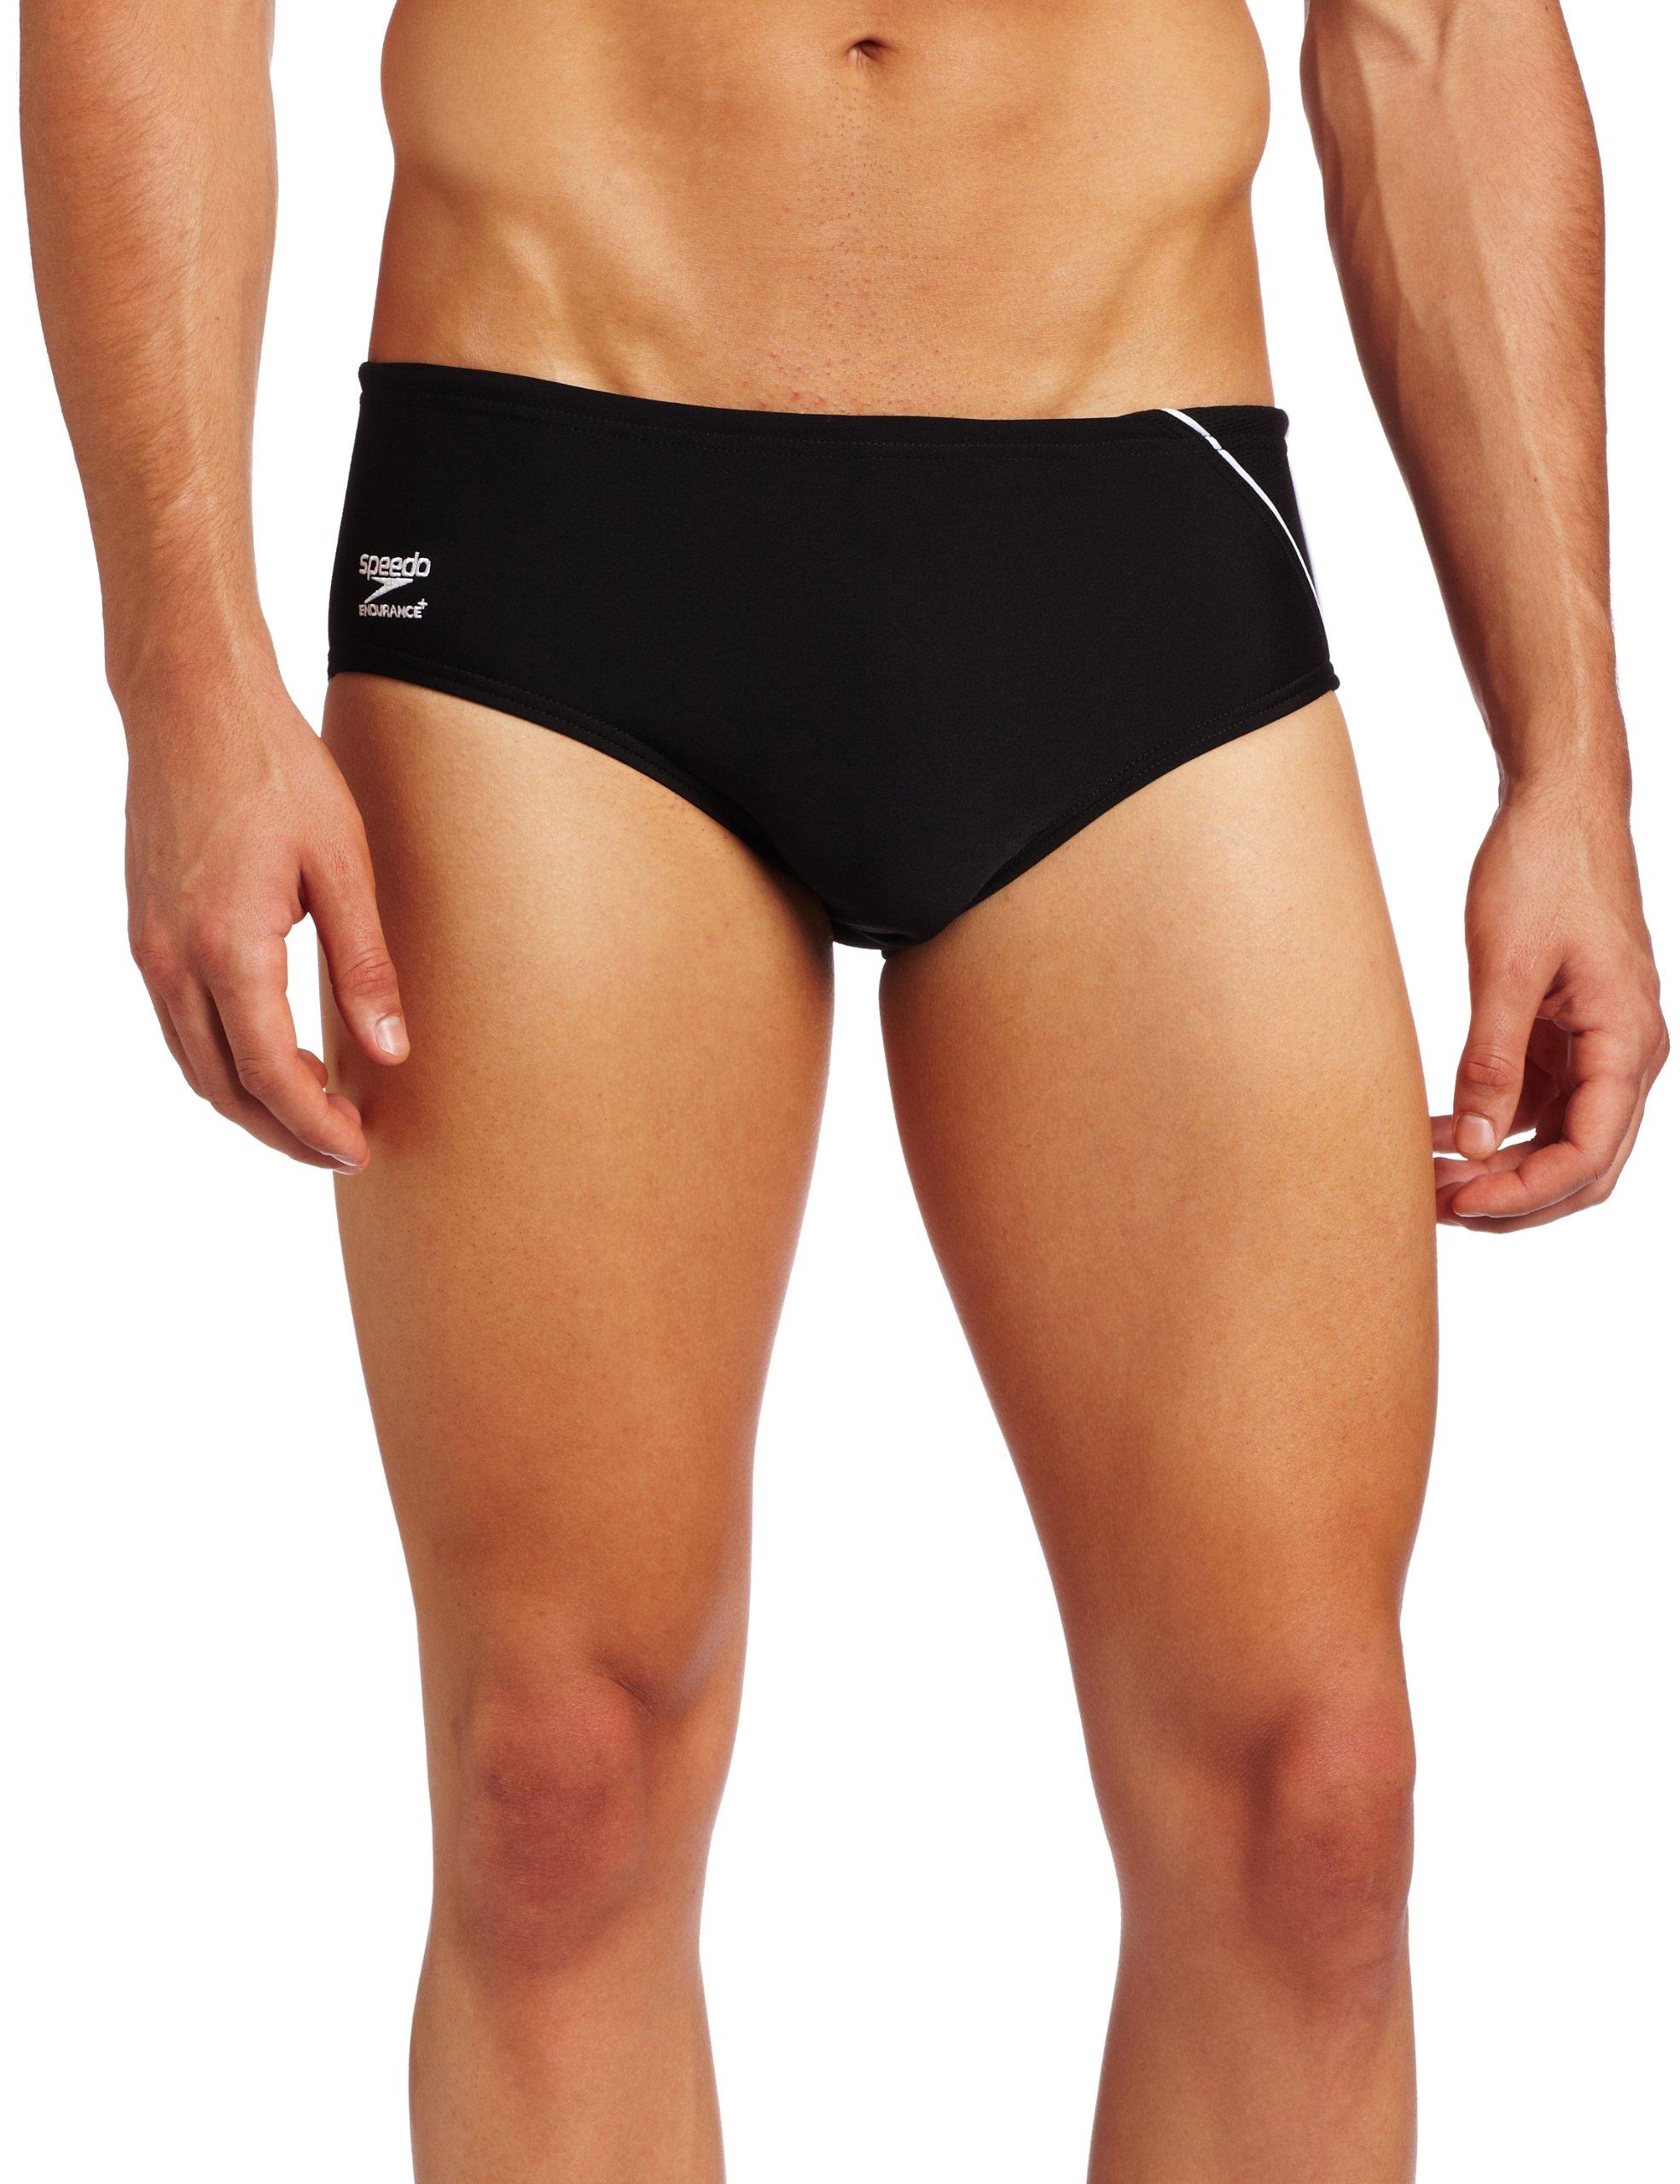 Speedo Men's Endurance+ Mercury Splice Brief Swimsuit, Black/Red, 26 by Speedo